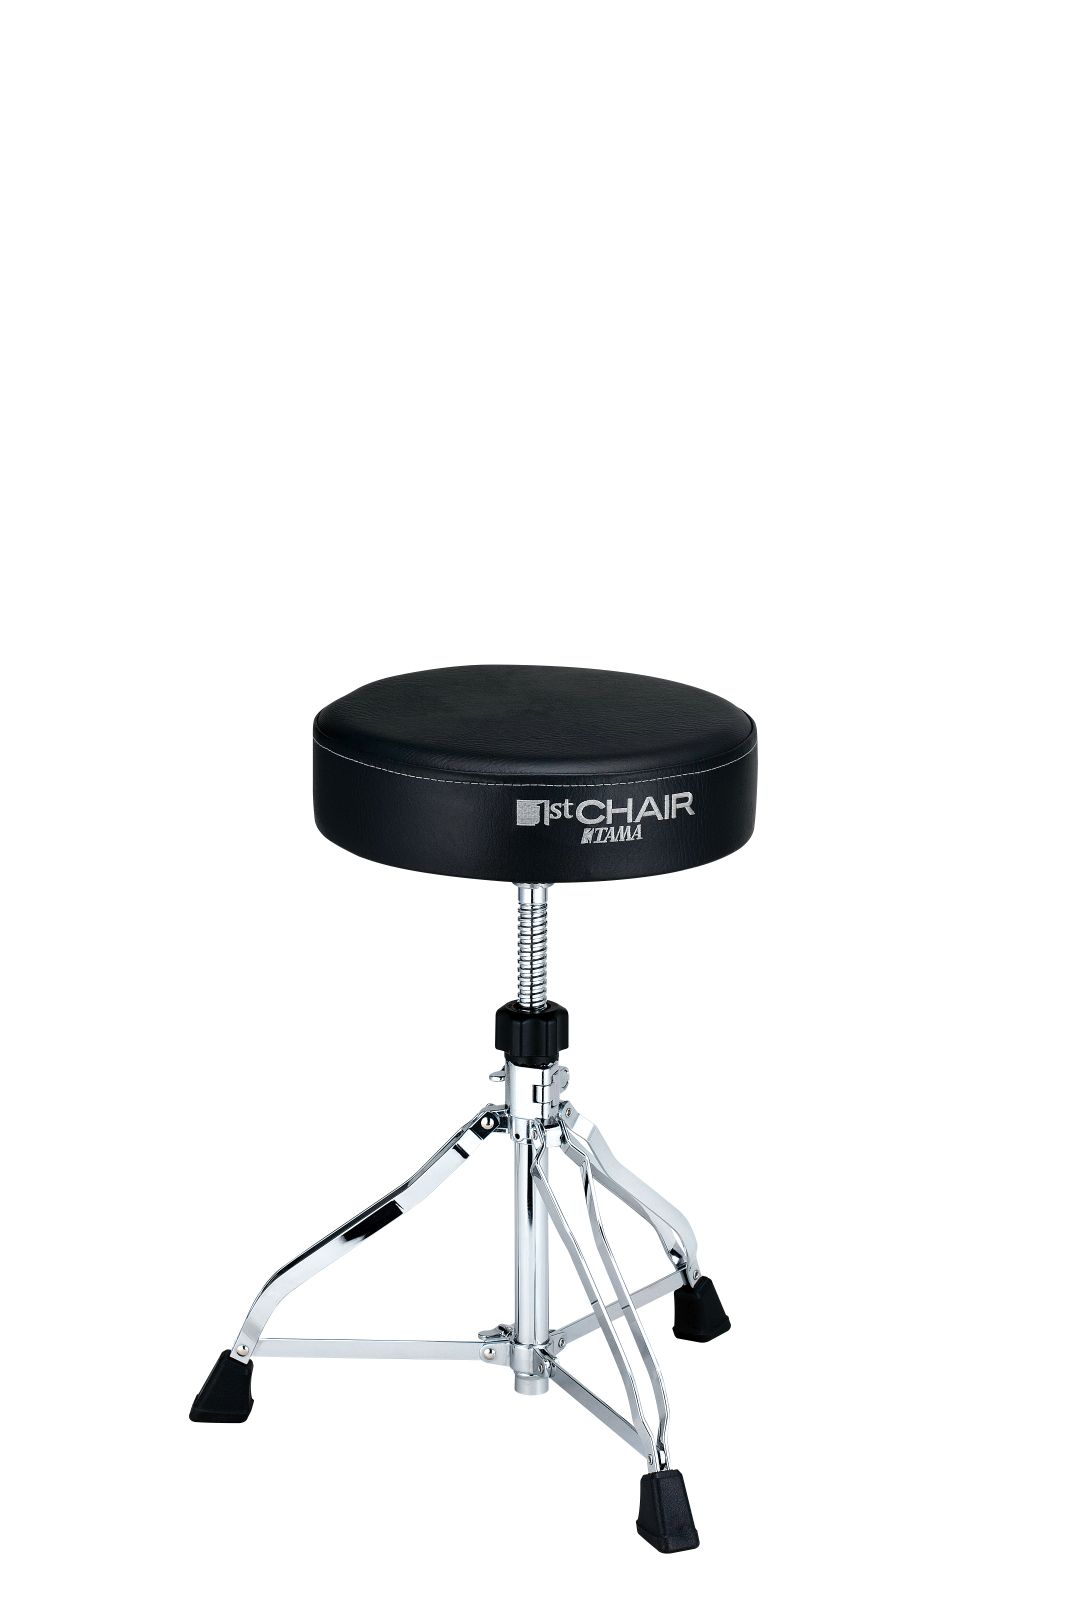 Tama HT230 1st Chair Drum Throne black